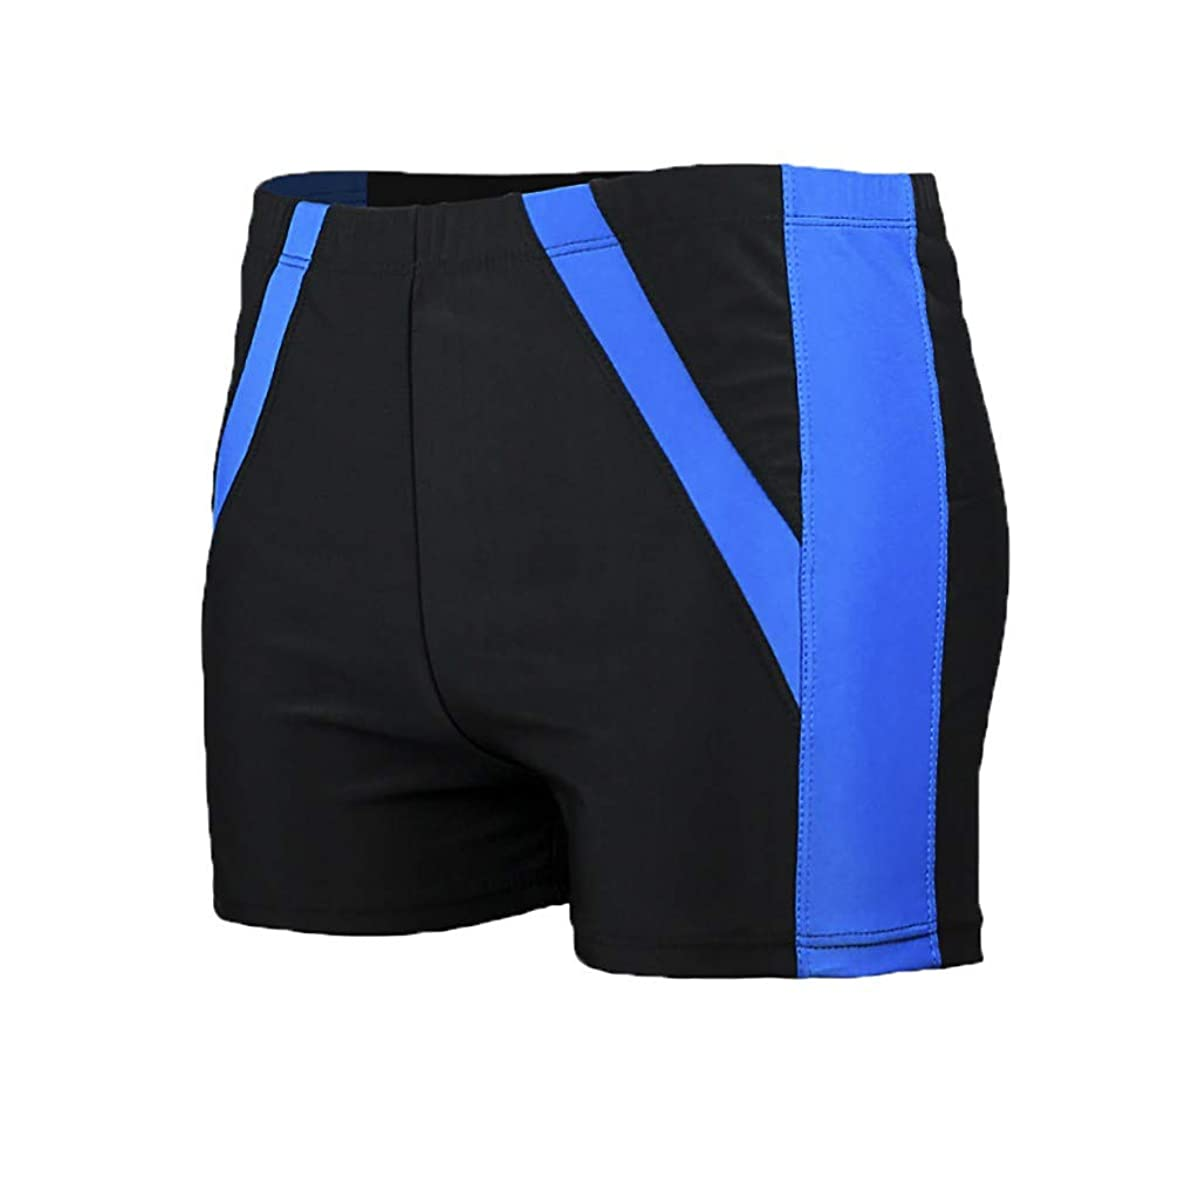 Sunyastor Plus Size Swimwear Men Basic Long Swimming Trunk Quick Dry Surf Camo Shorts Flat Angle Comfortable Beach Swimsuits